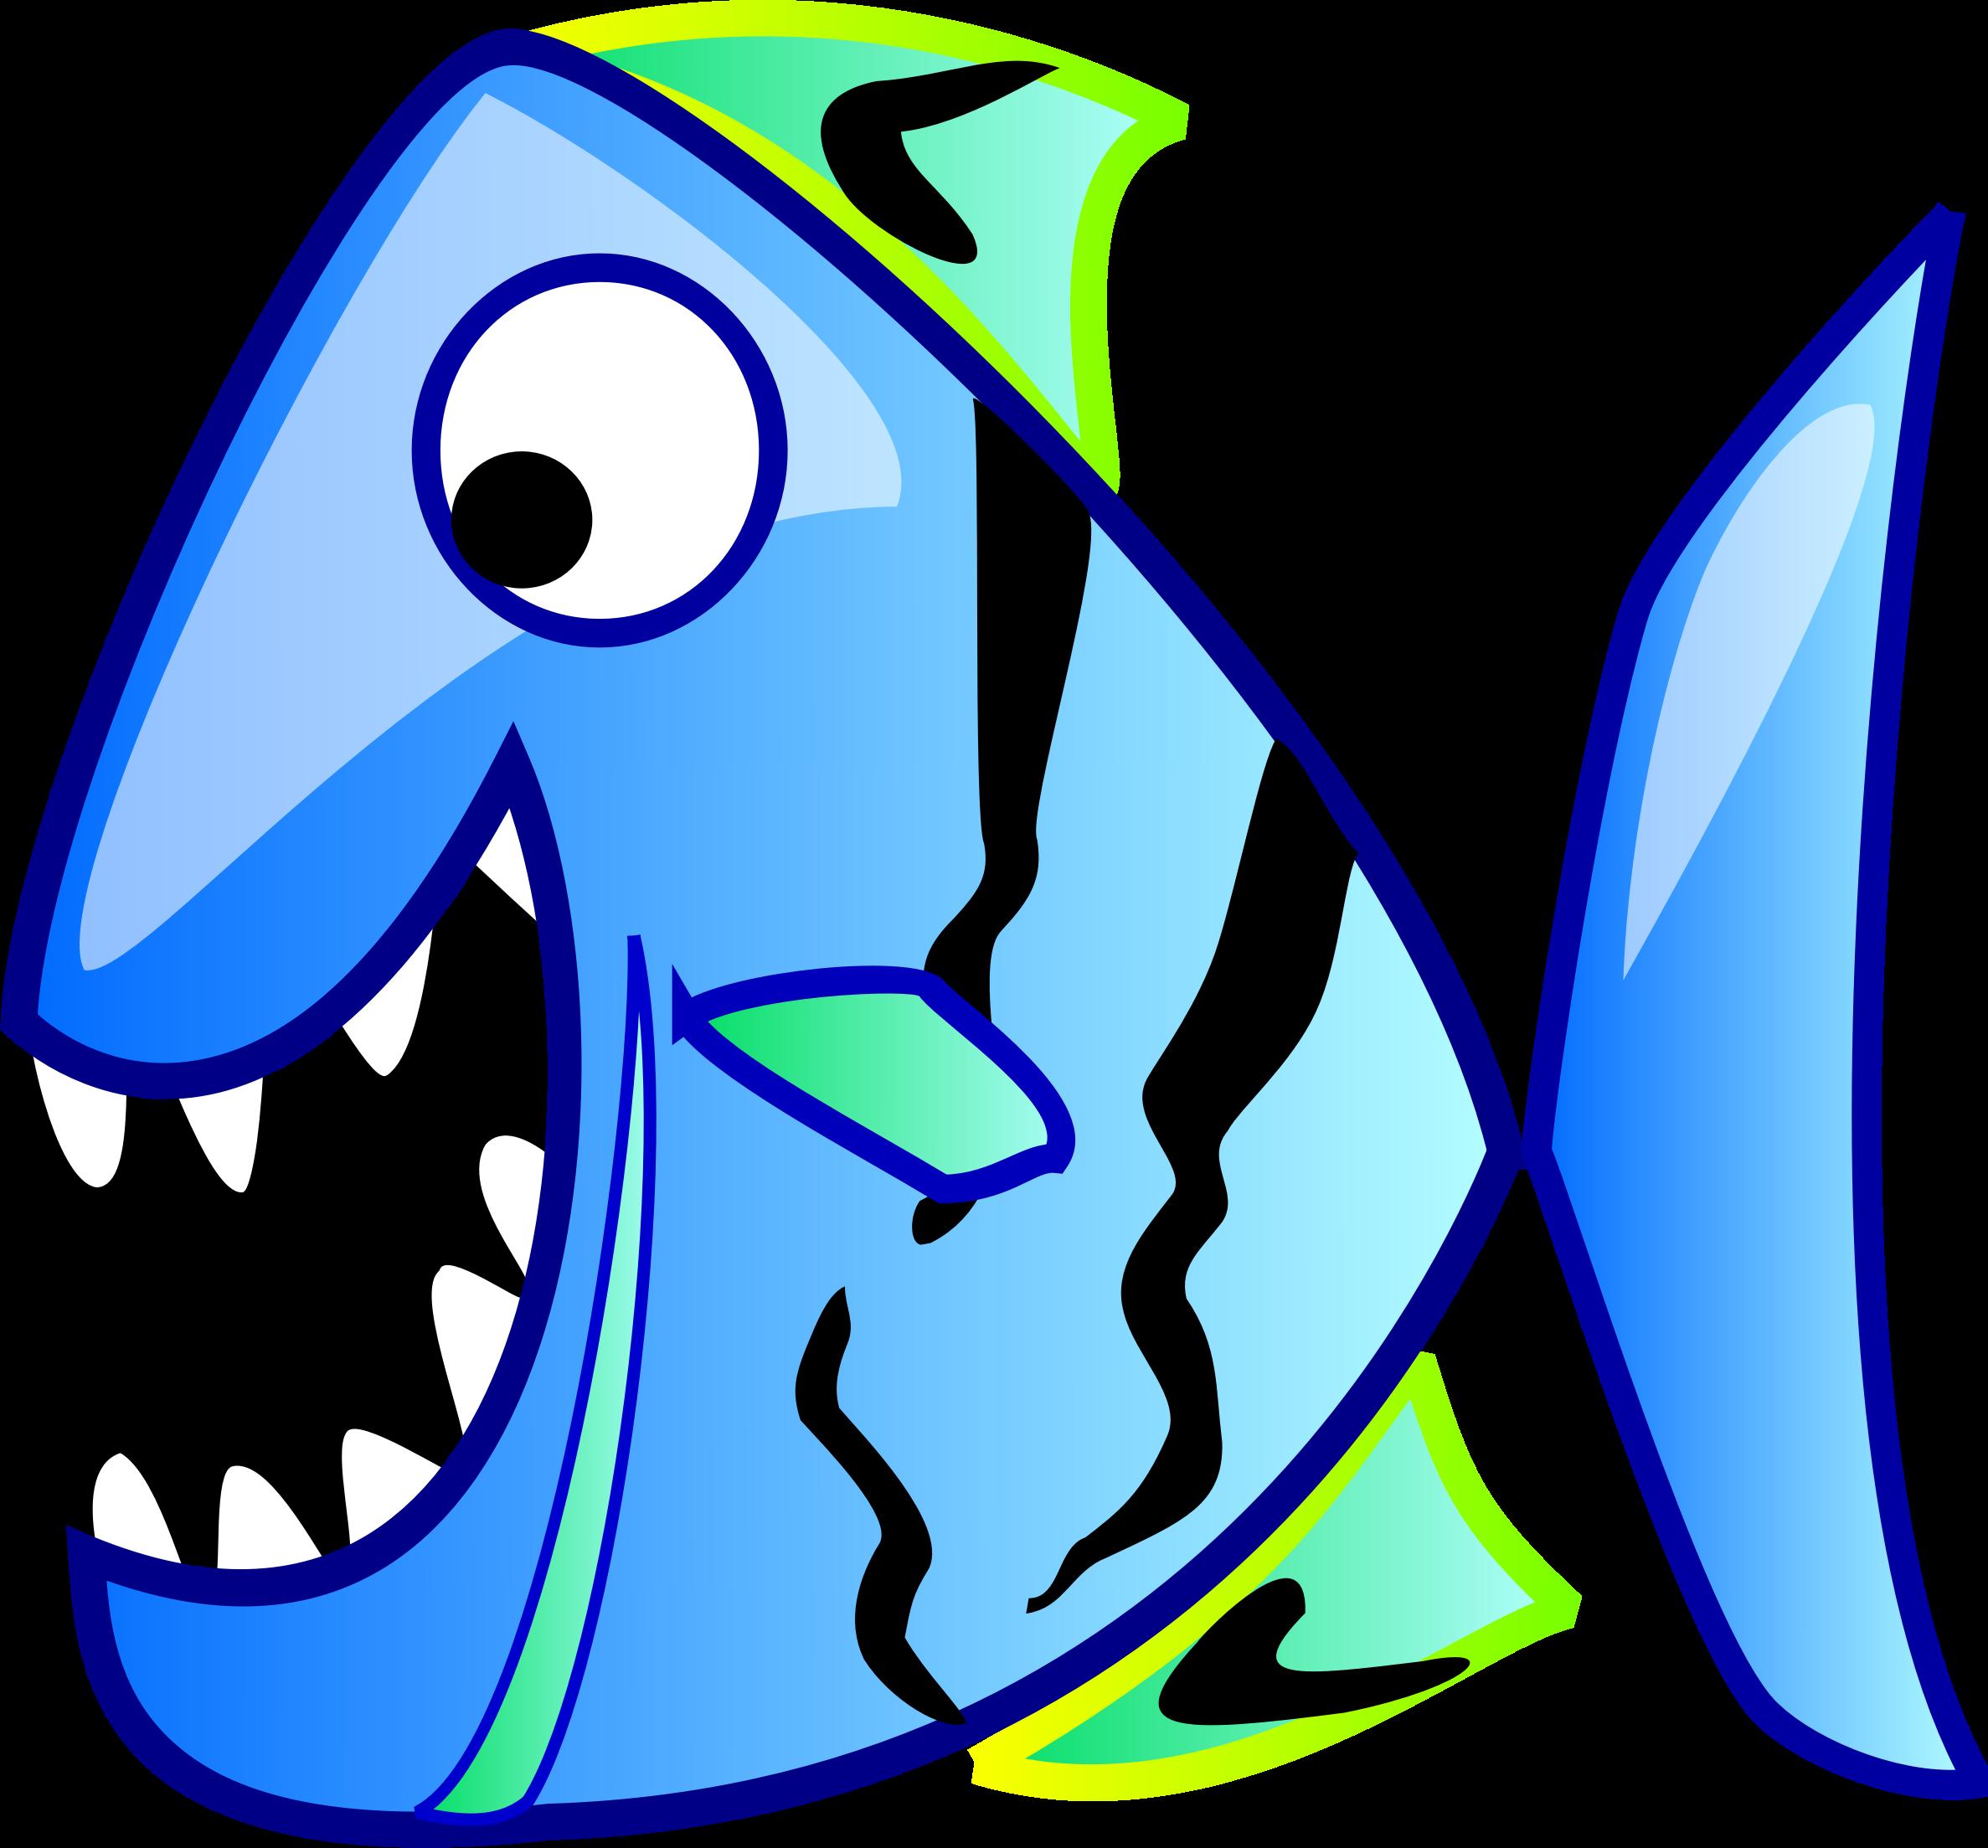 Blue fish clipart image Clipart - bluefish image